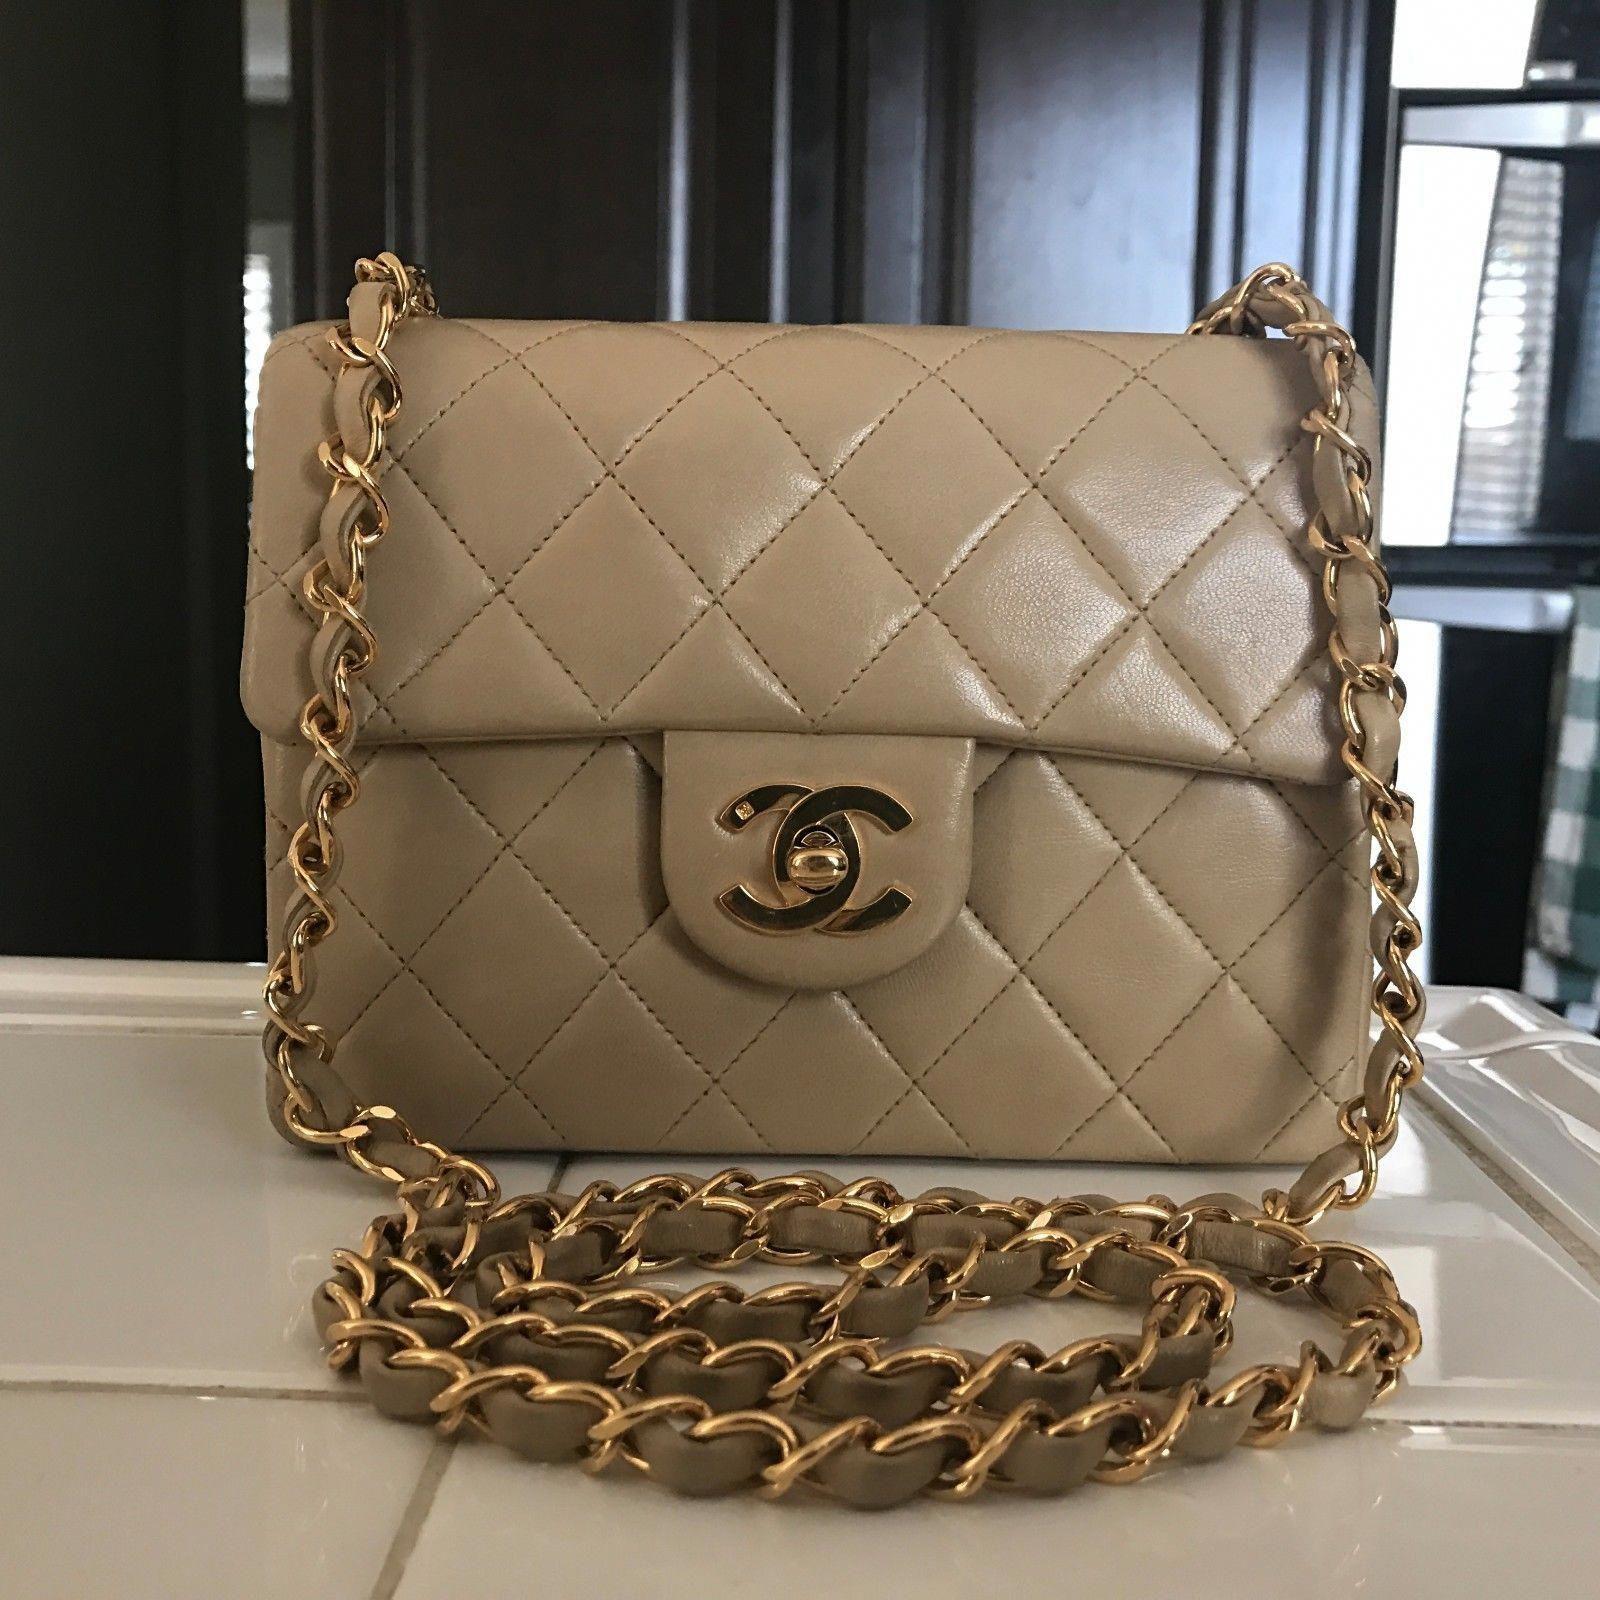 a32ac93c1400 100% Auth Chanel Vintage Mini Flap Crossbody Lambskin Beige Gold Hw Bag  #Chanelhandbags